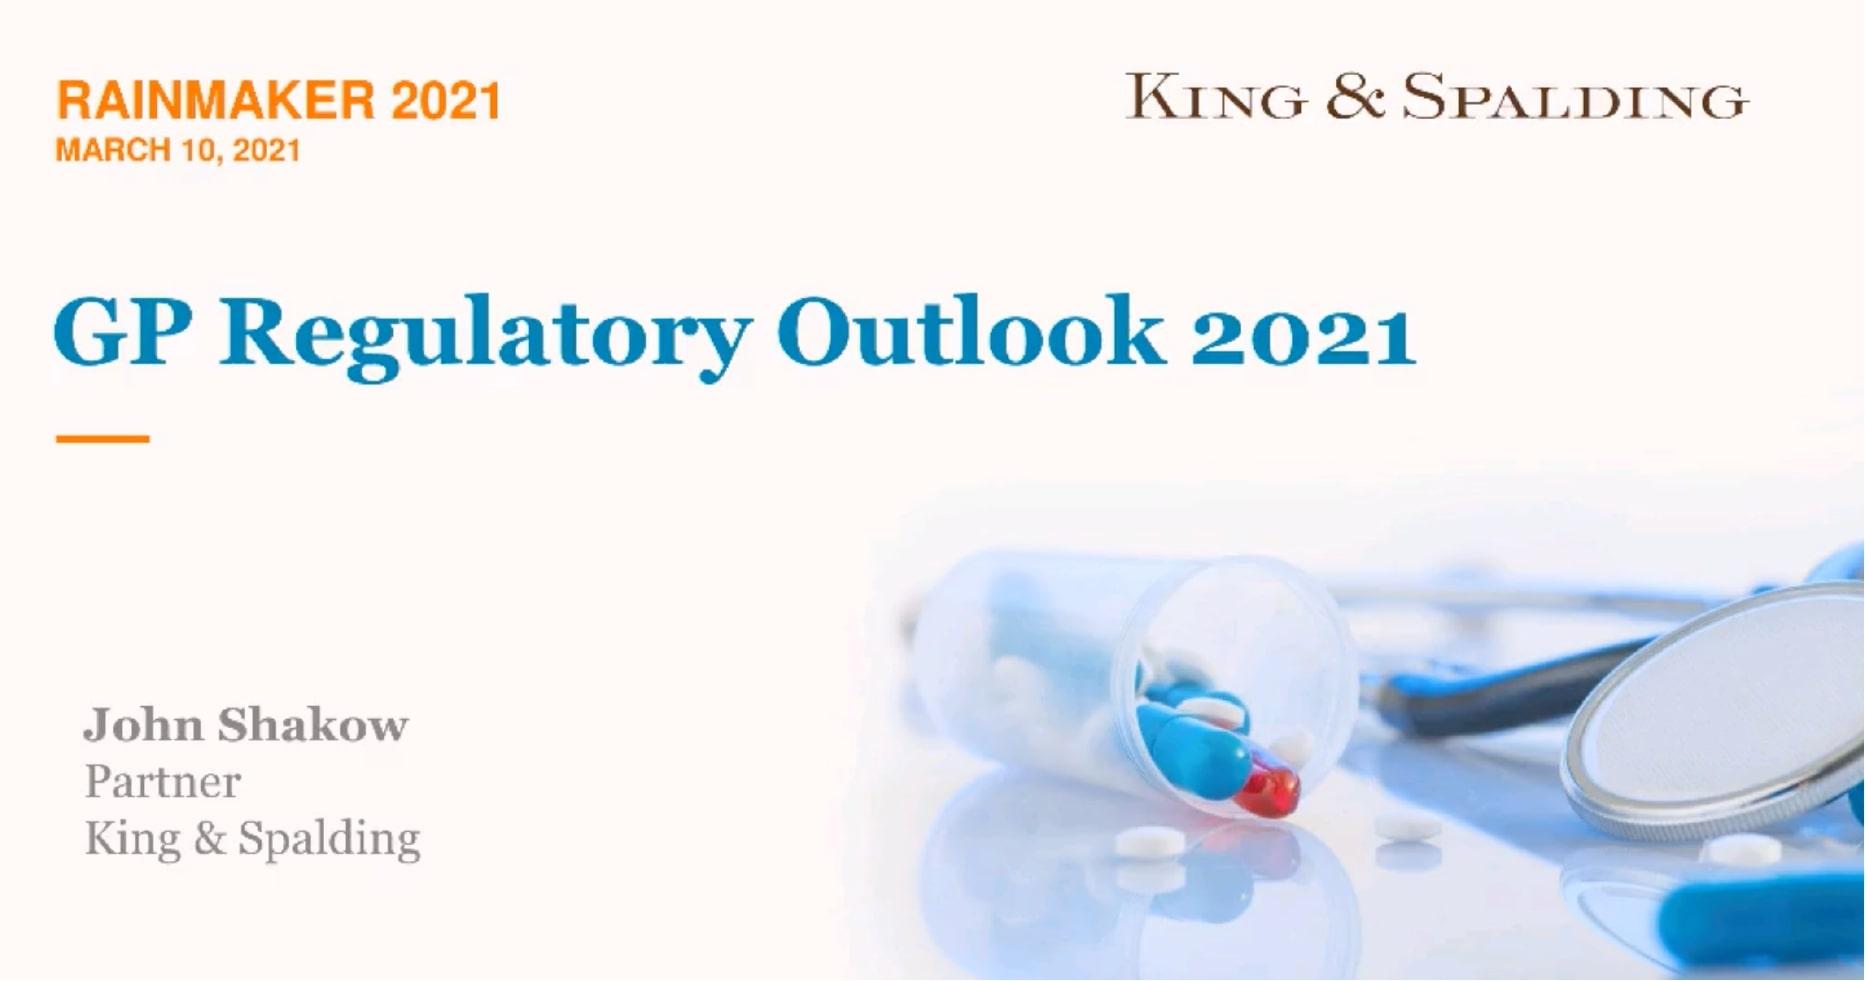 regulatory-outlook-2021-thank-you-1864x980